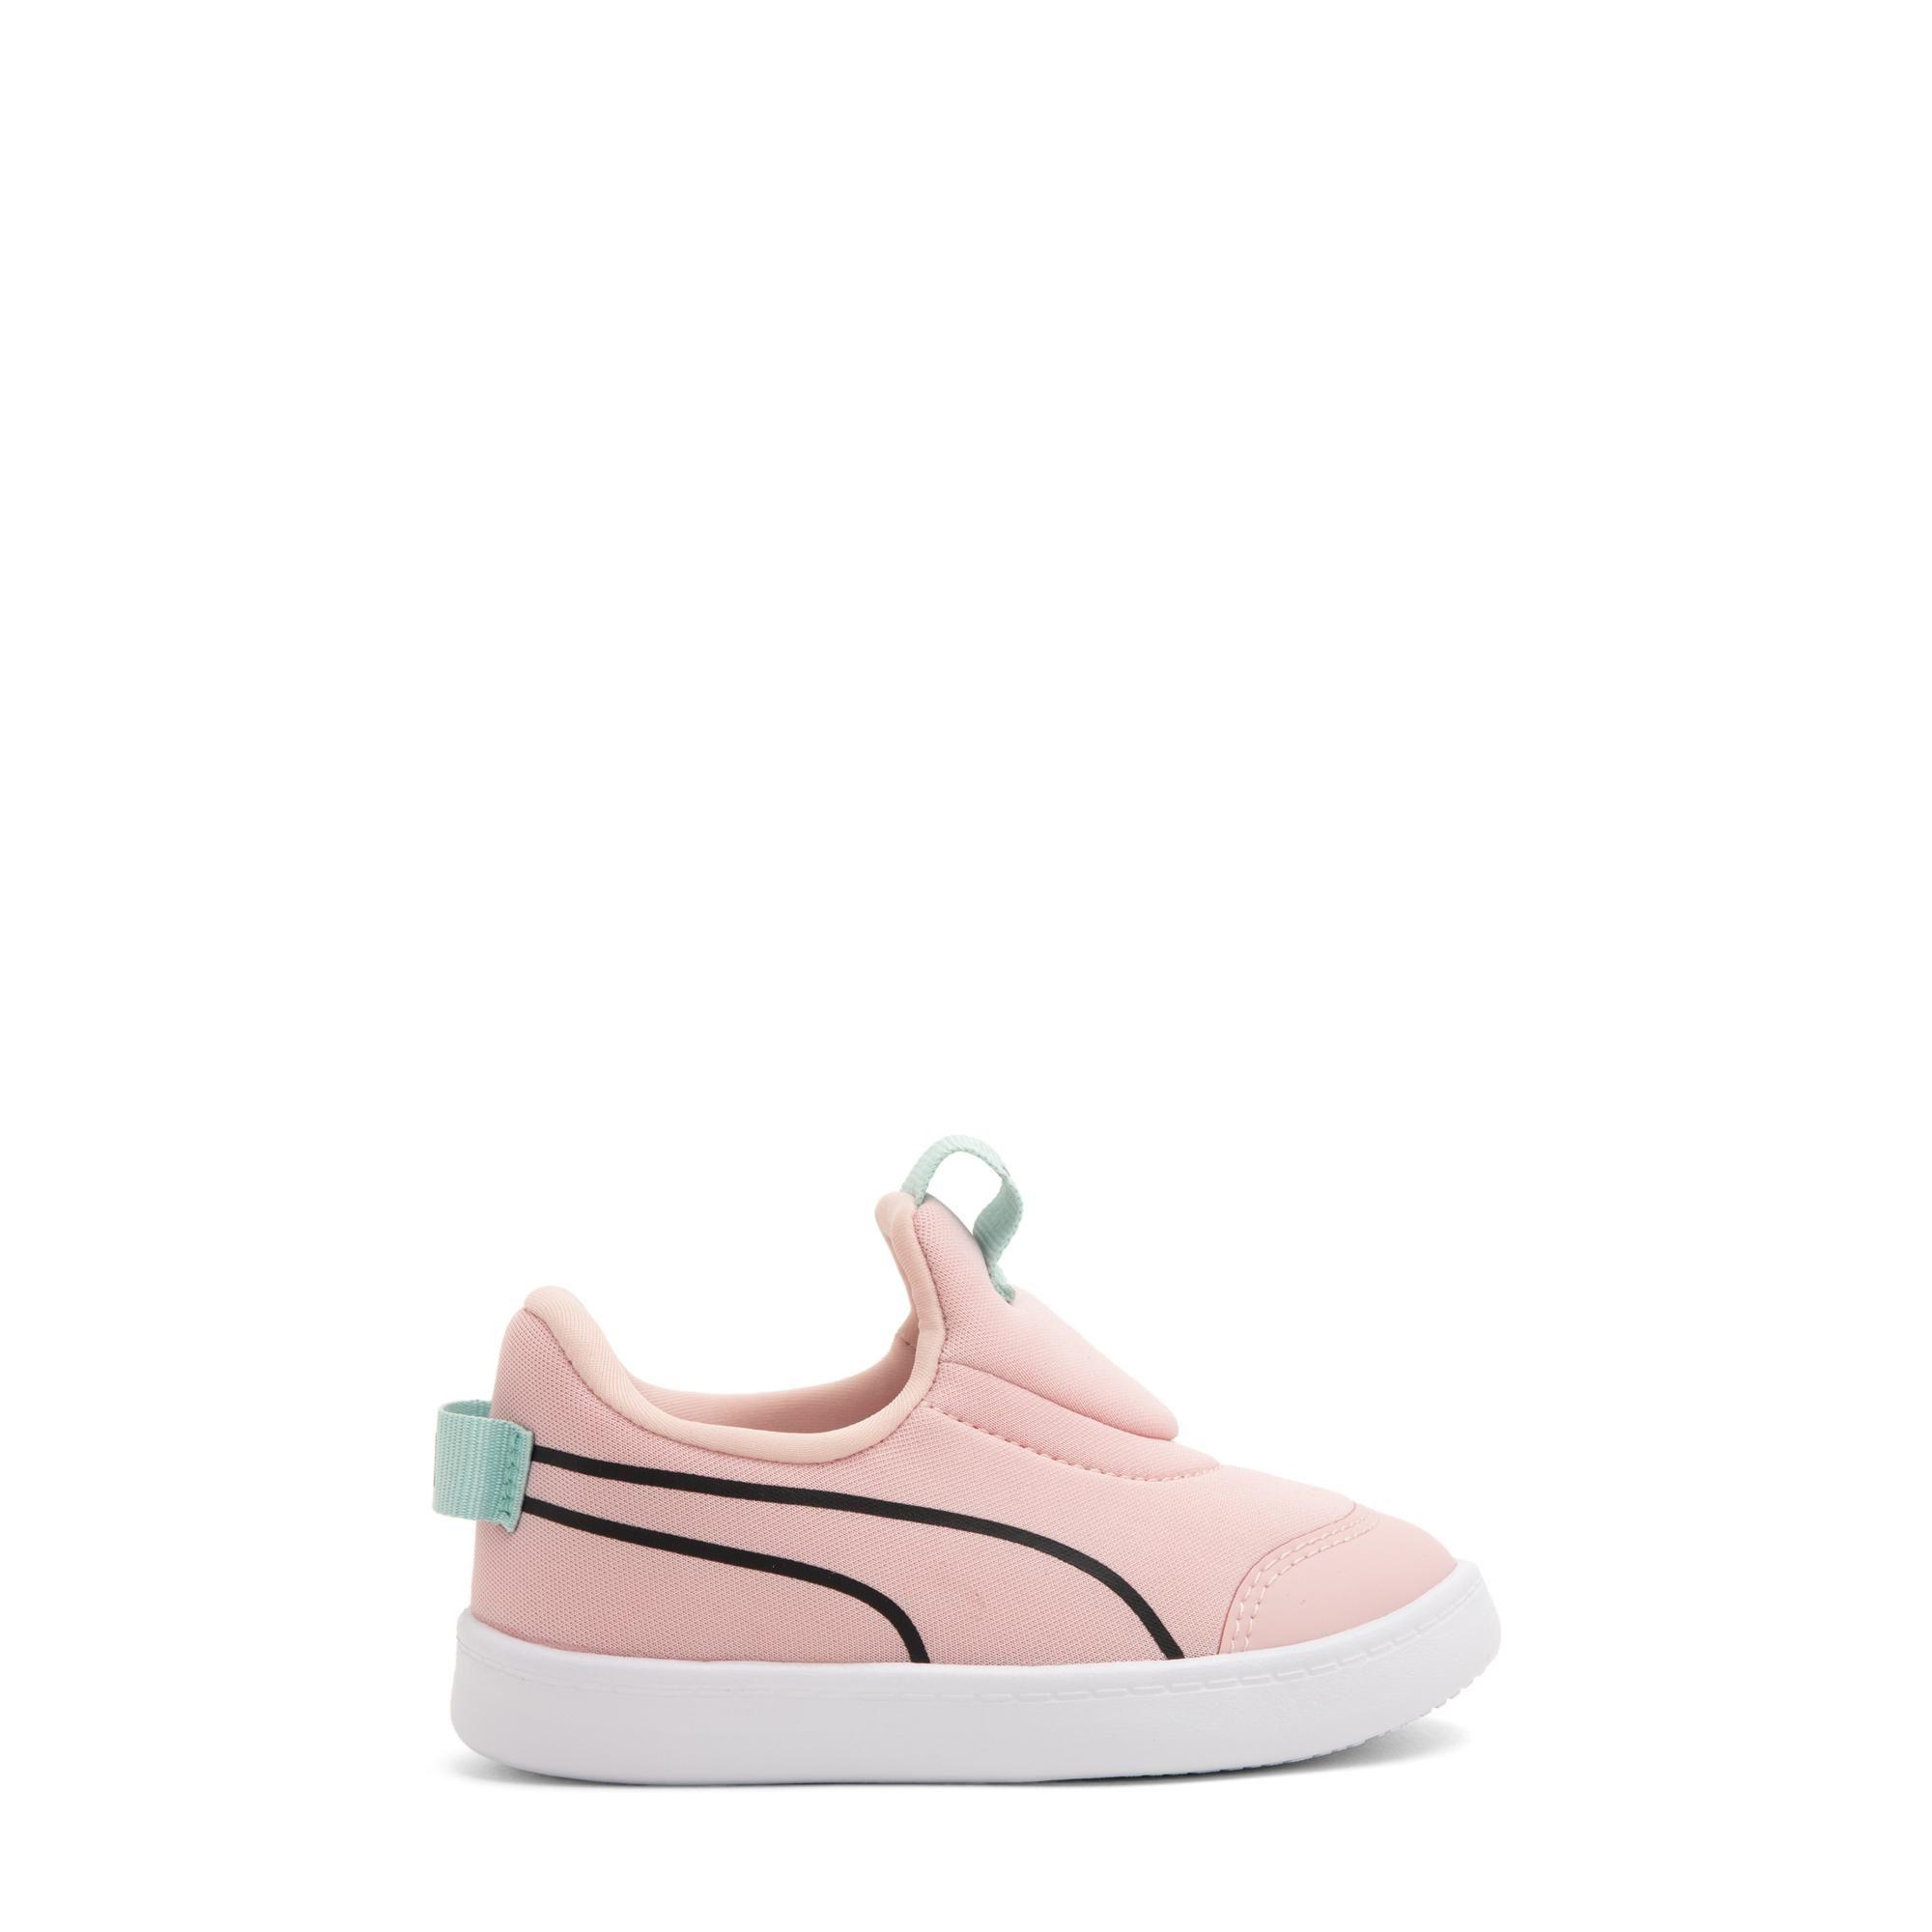 Courtflex V2 slip-on sneakers